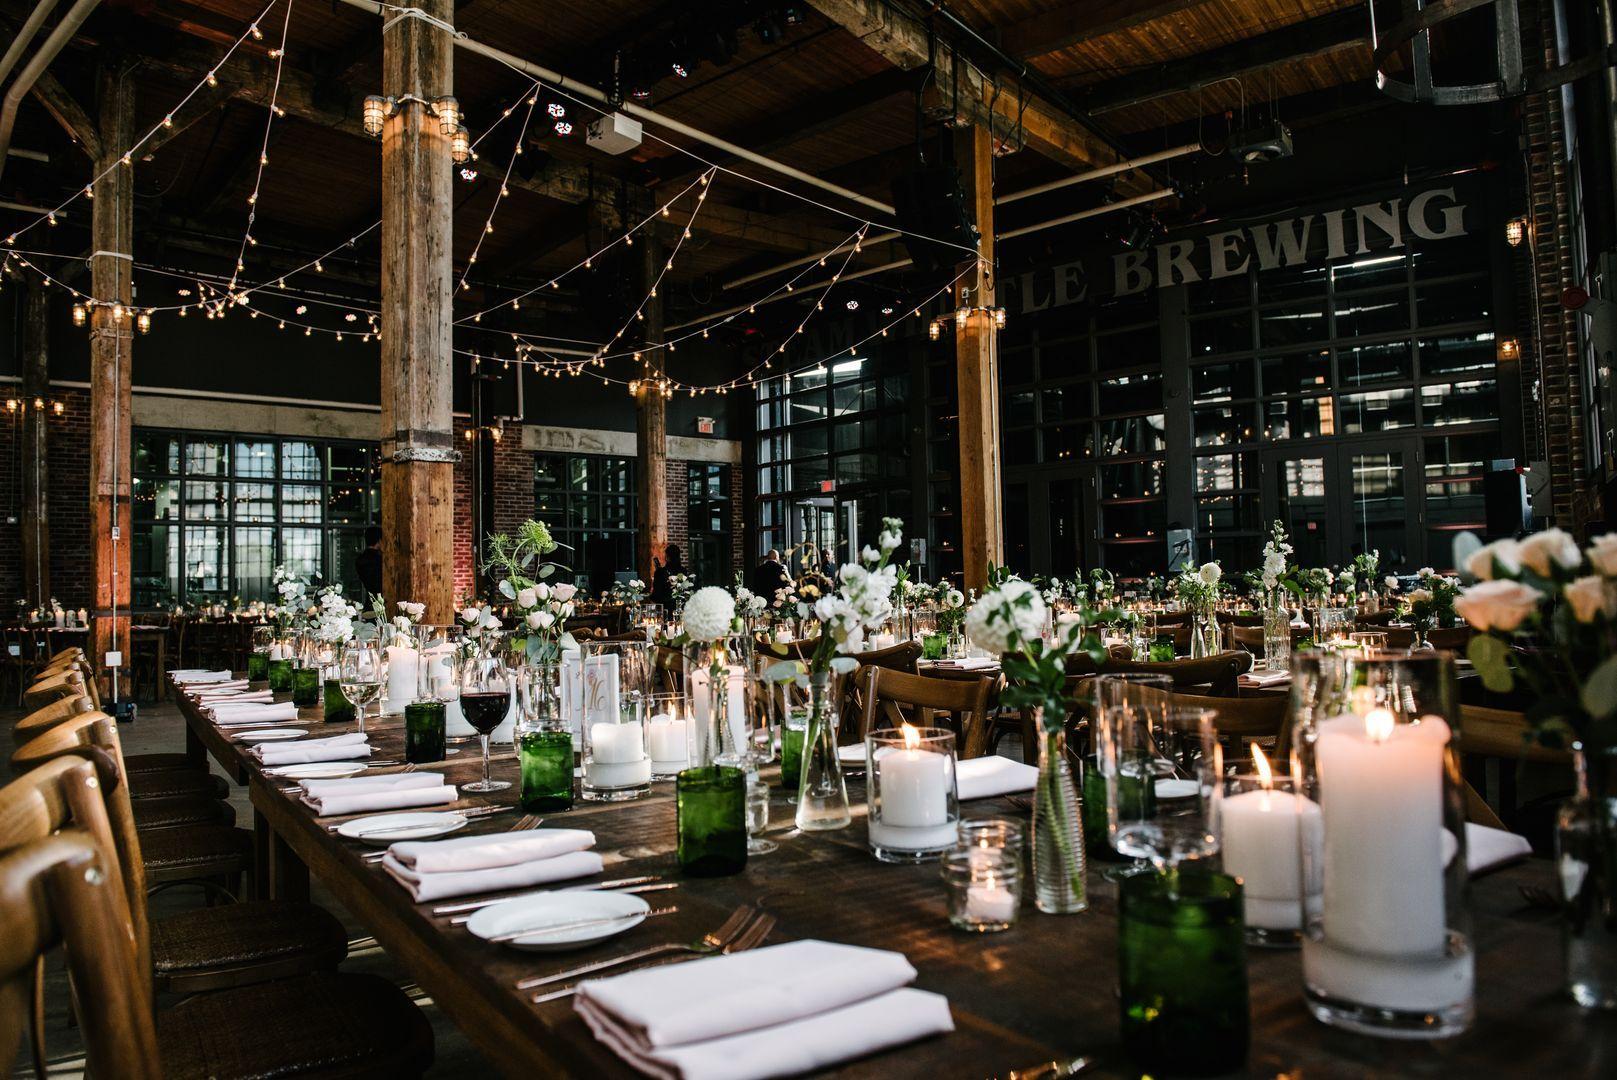 Steamwhistle Brewery Toronto wedding, Brewery wedding